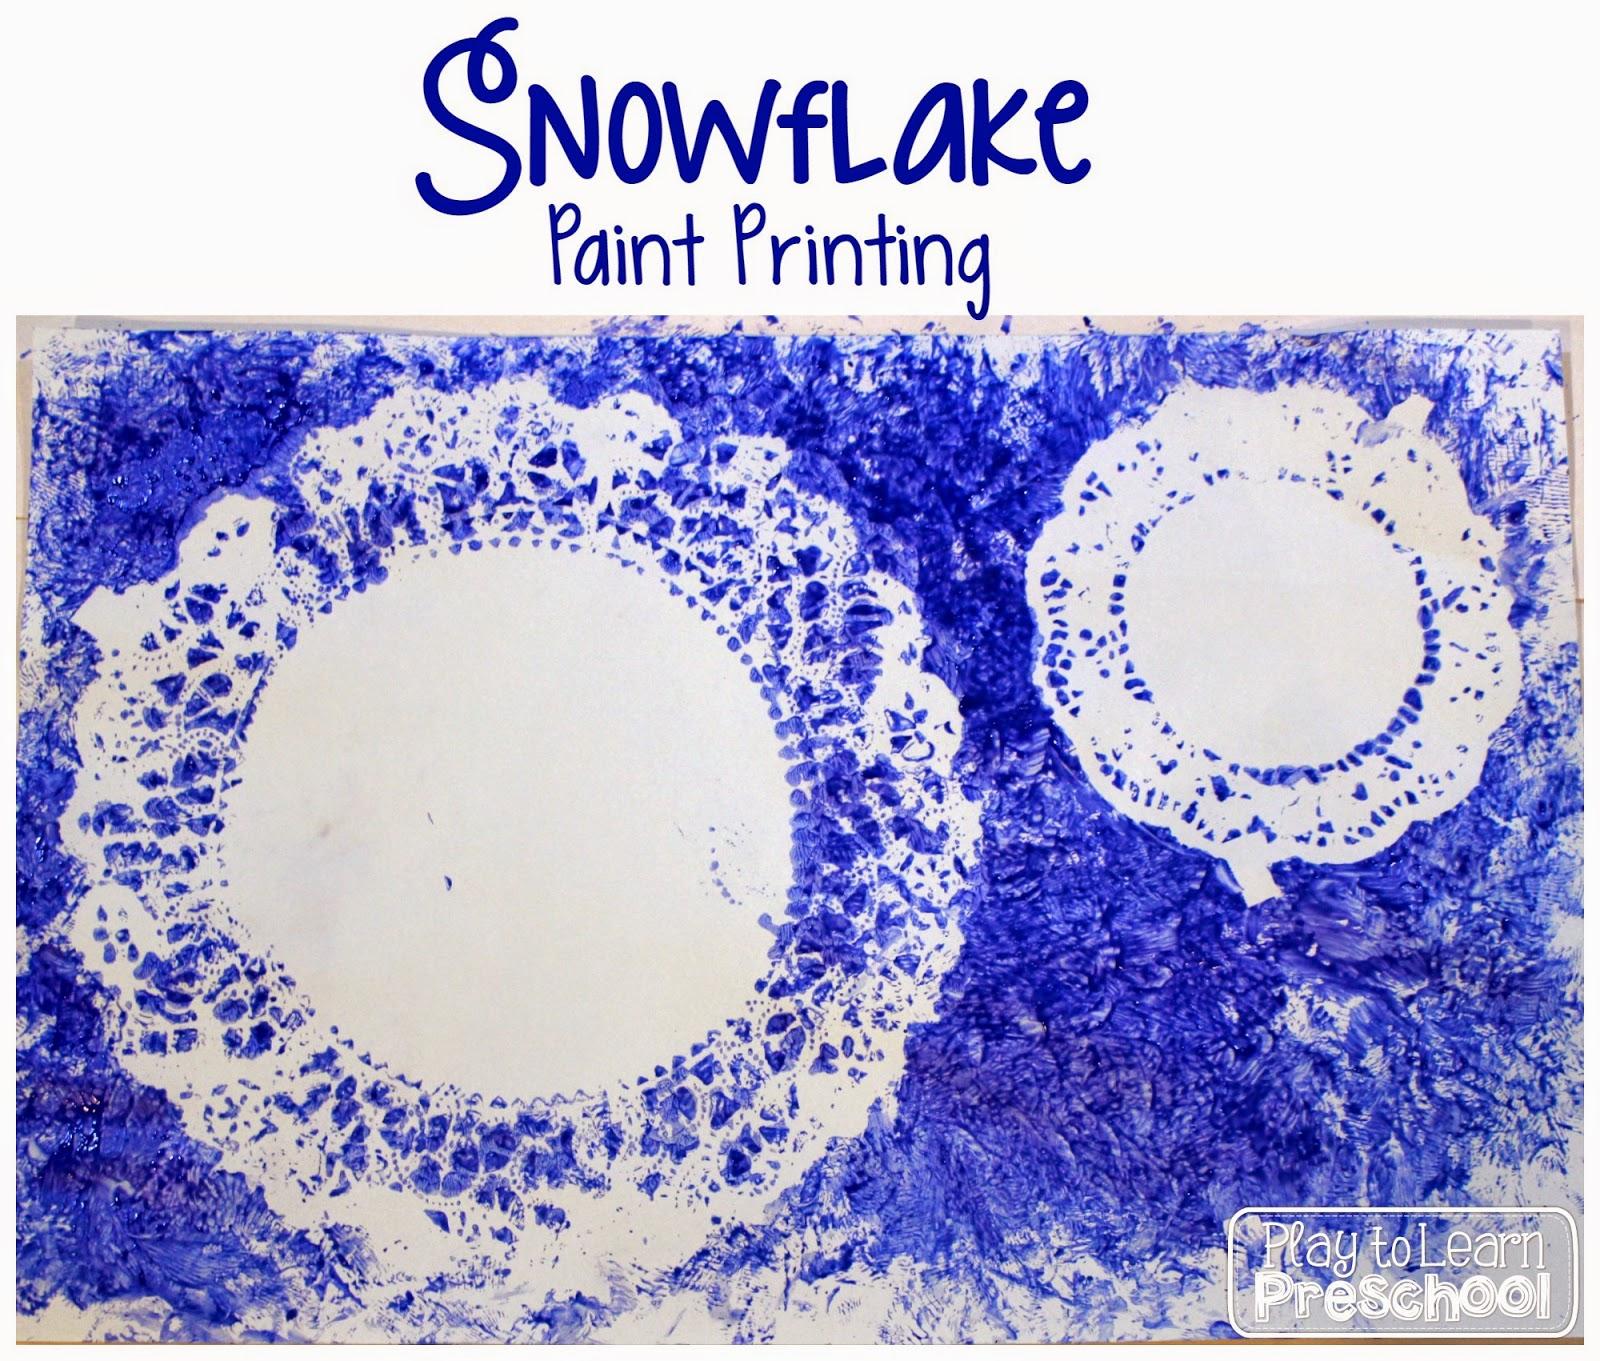 Play To Learn Preschool Snowflake Paint Printing